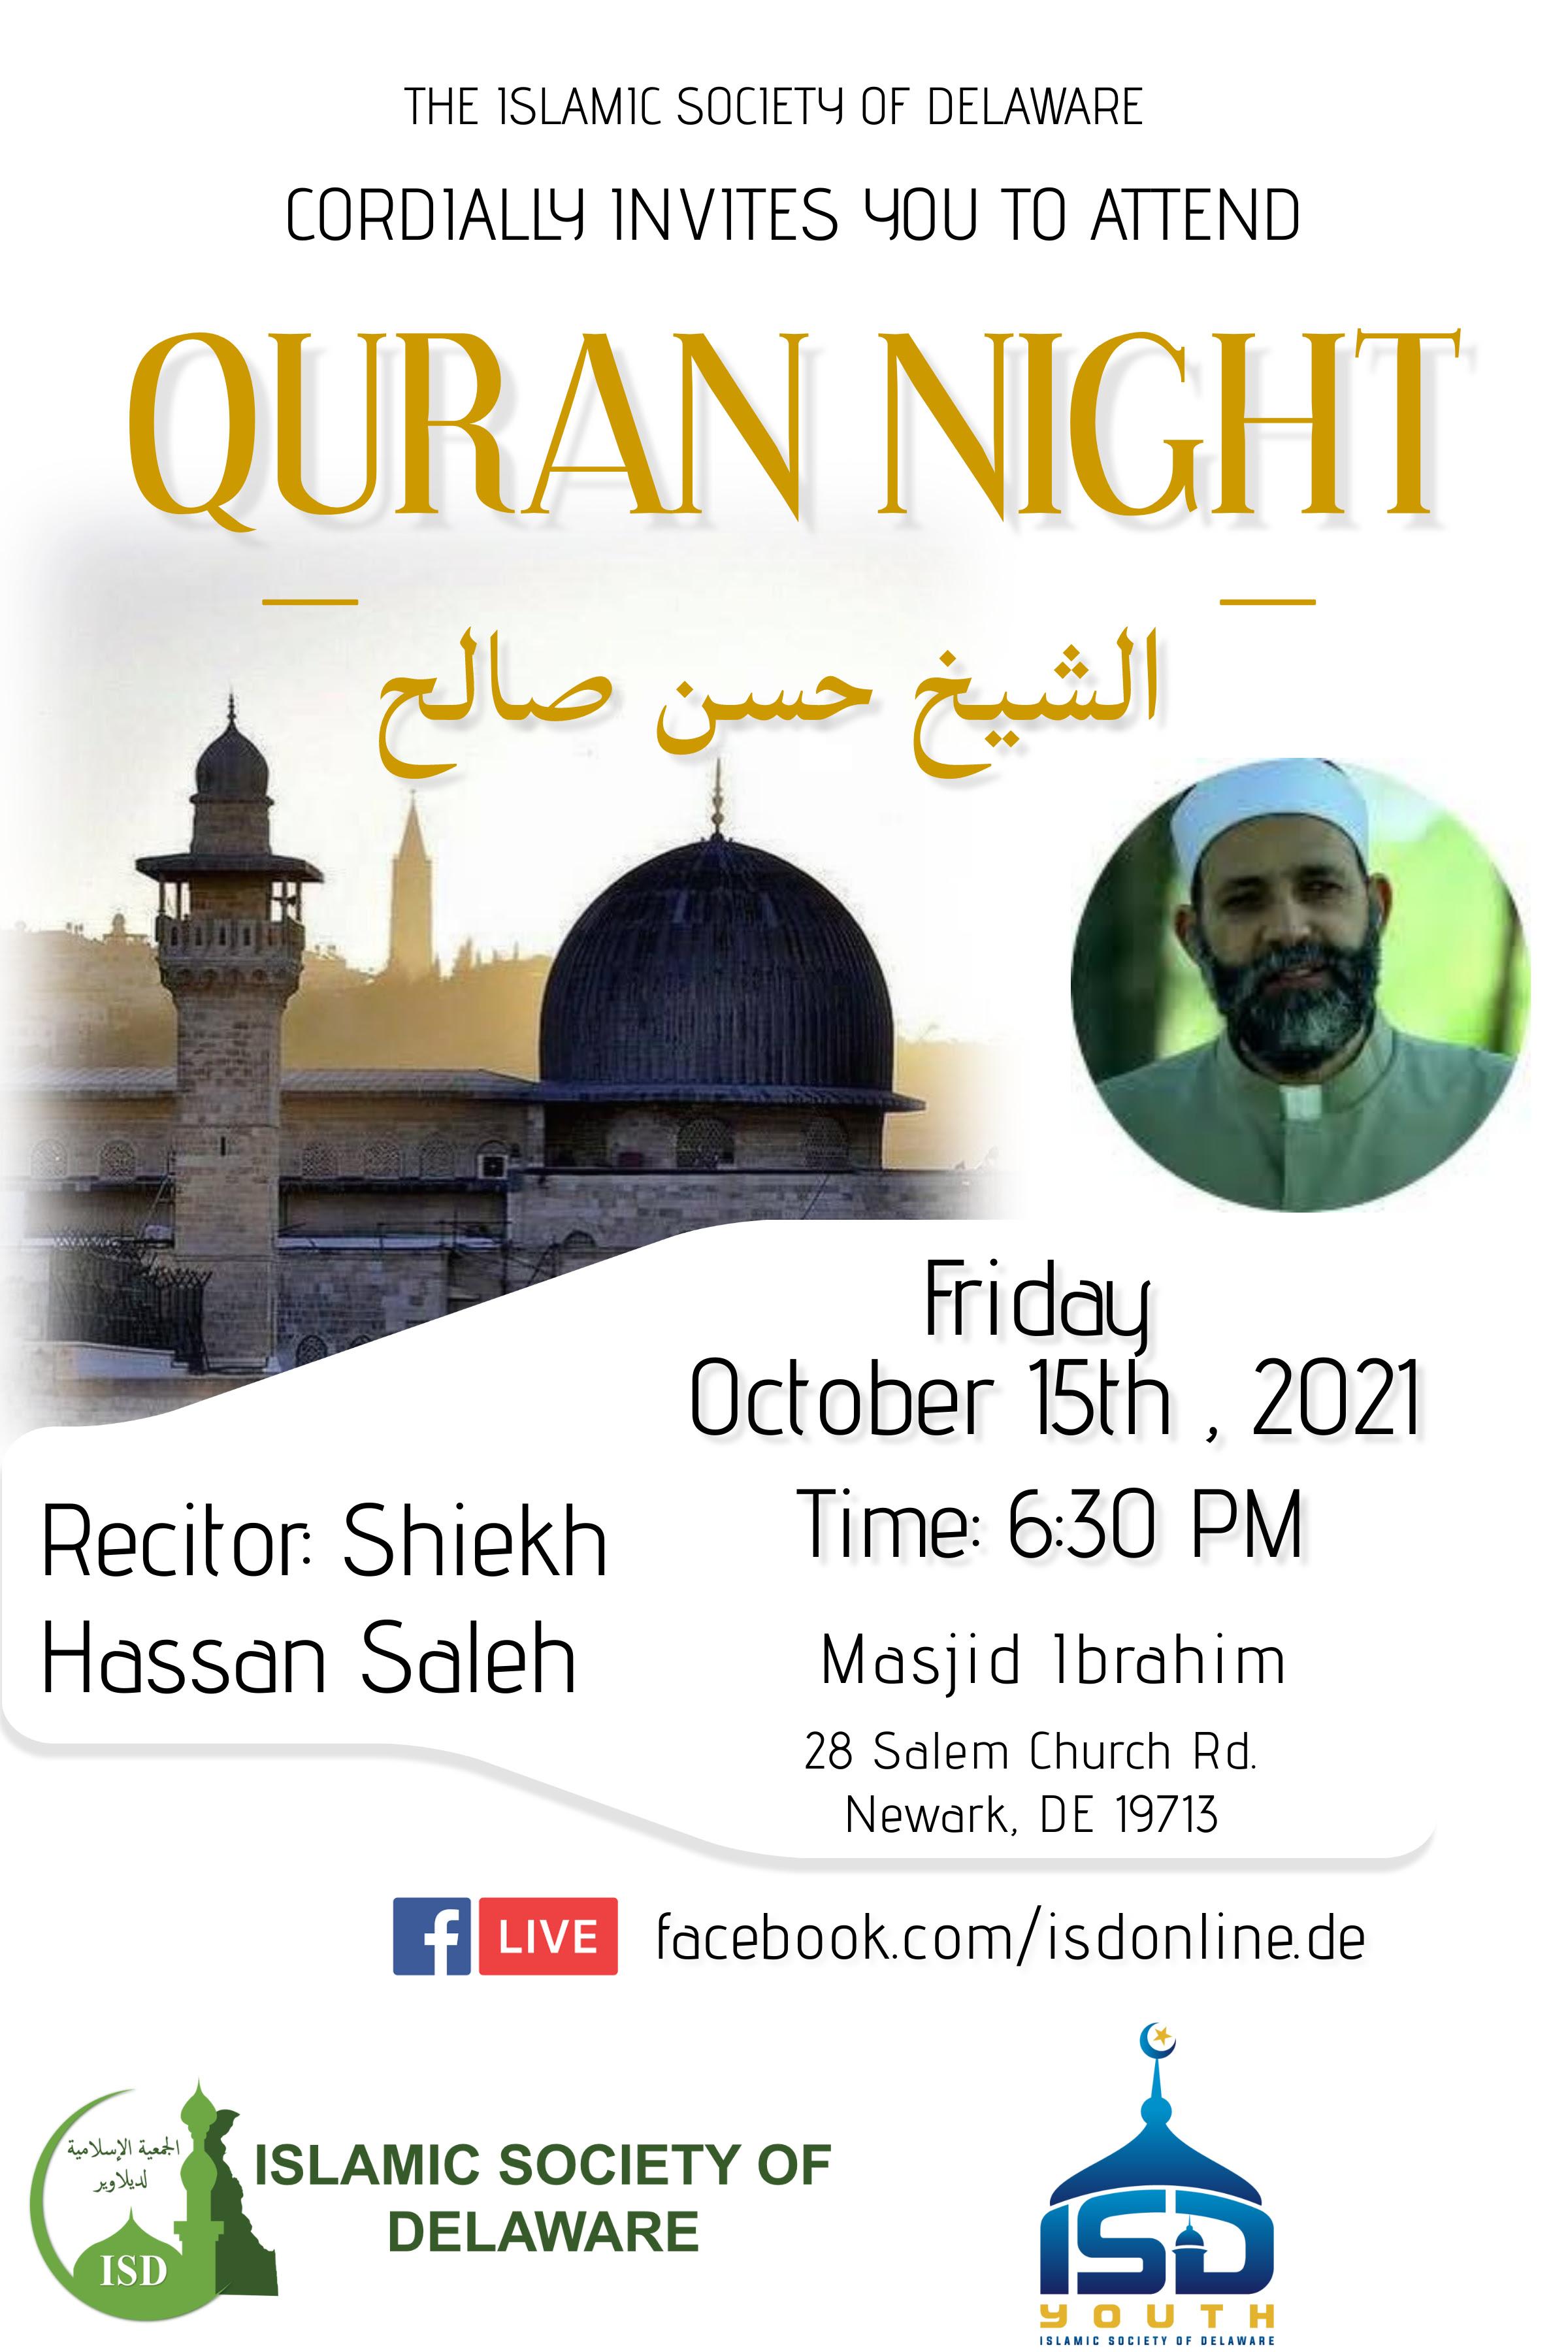 Quran Night with Shiekh Hassan Saleh